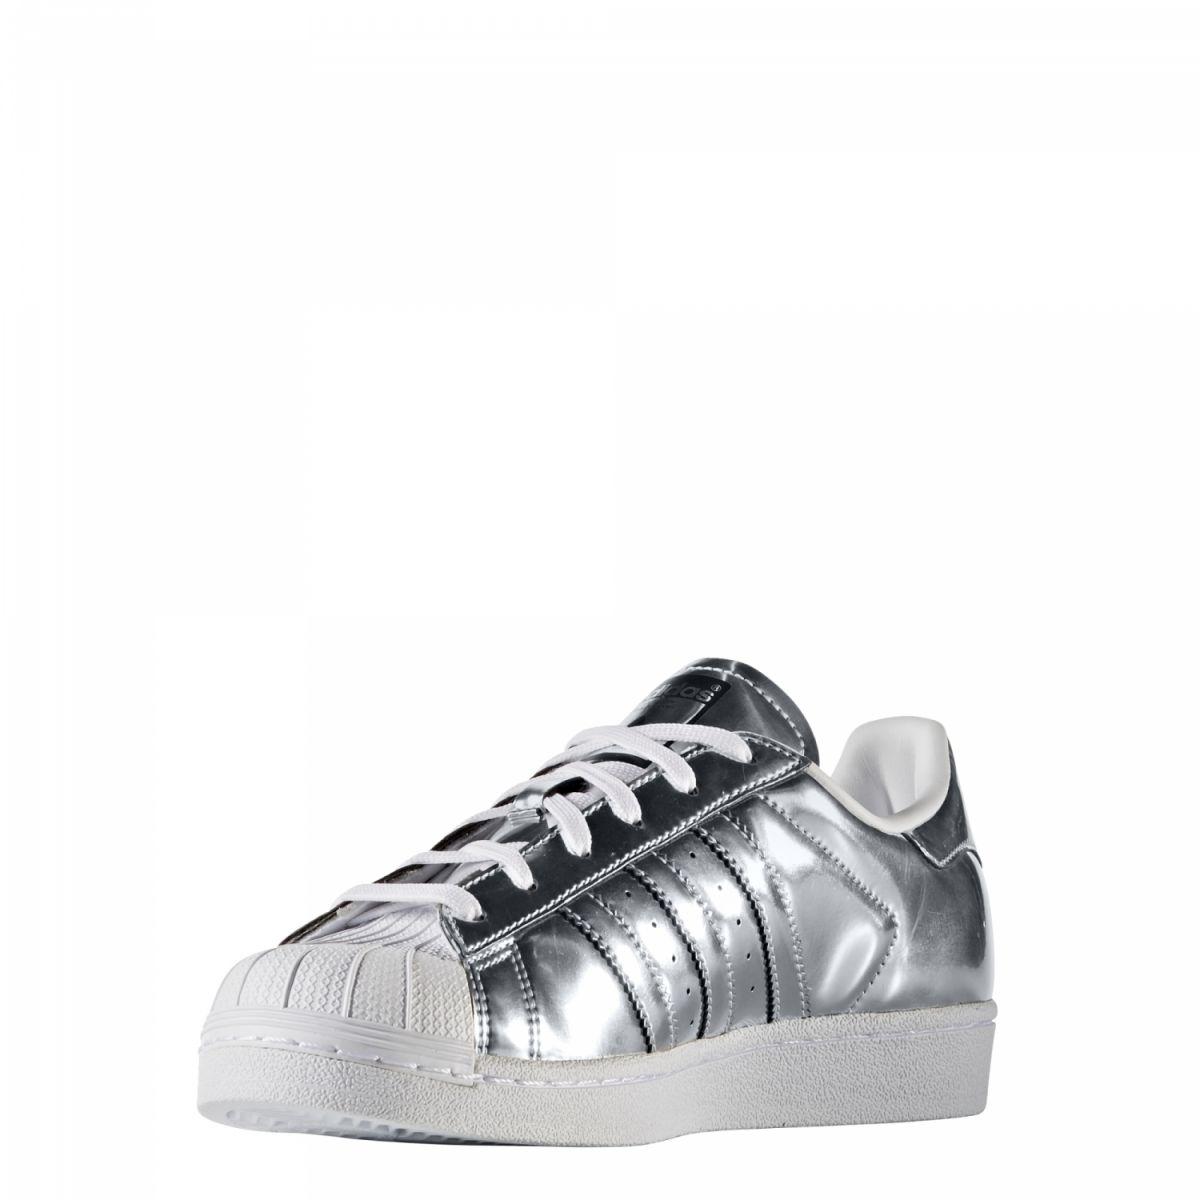 sport klingenmaier adidas originals superstar metallic. Black Bedroom Furniture Sets. Home Design Ideas